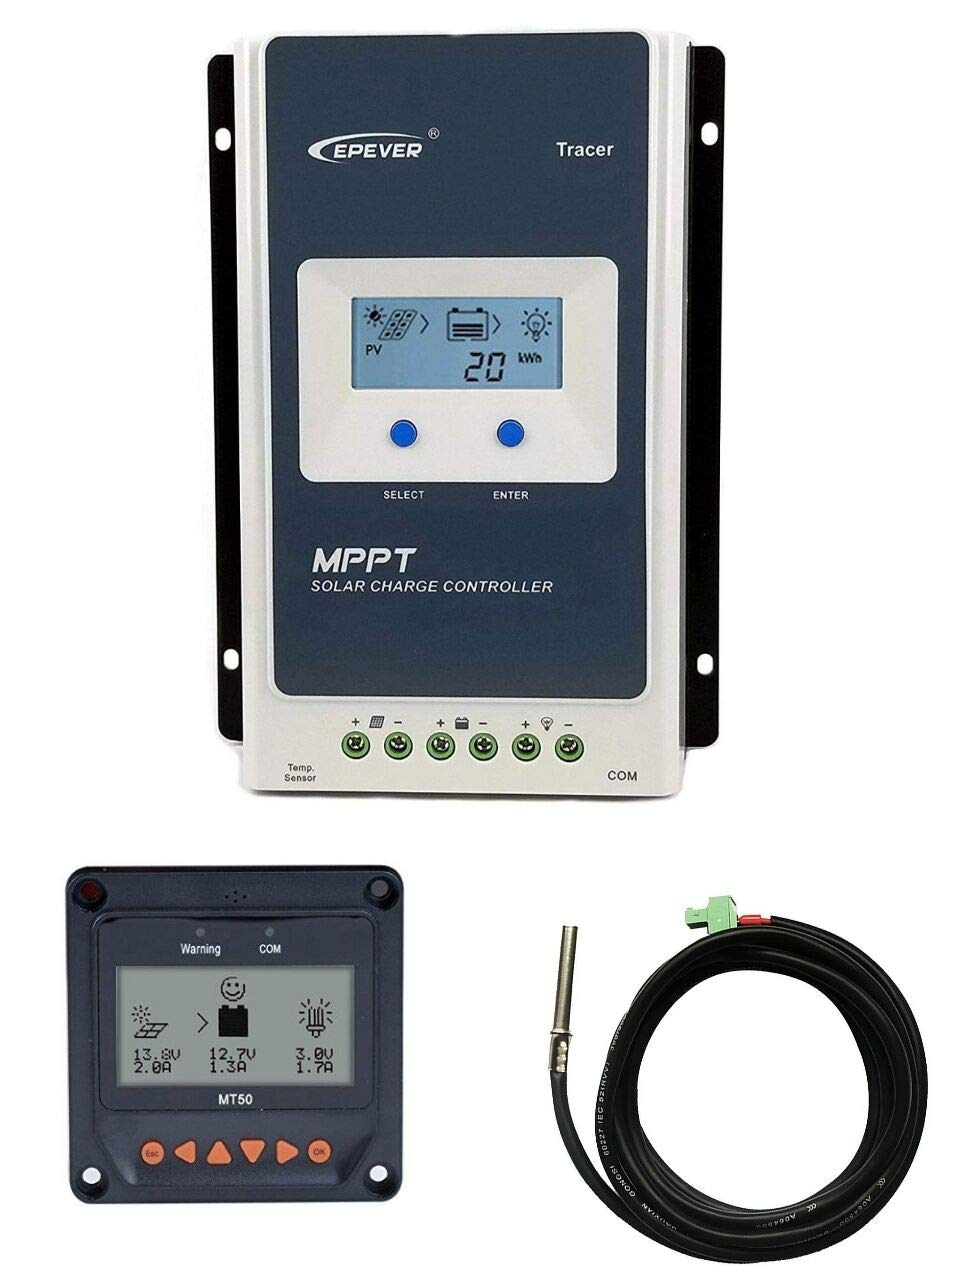 Anancooler MT50 Remote Meter Controller per regolatore di carica solare Epever MPPT